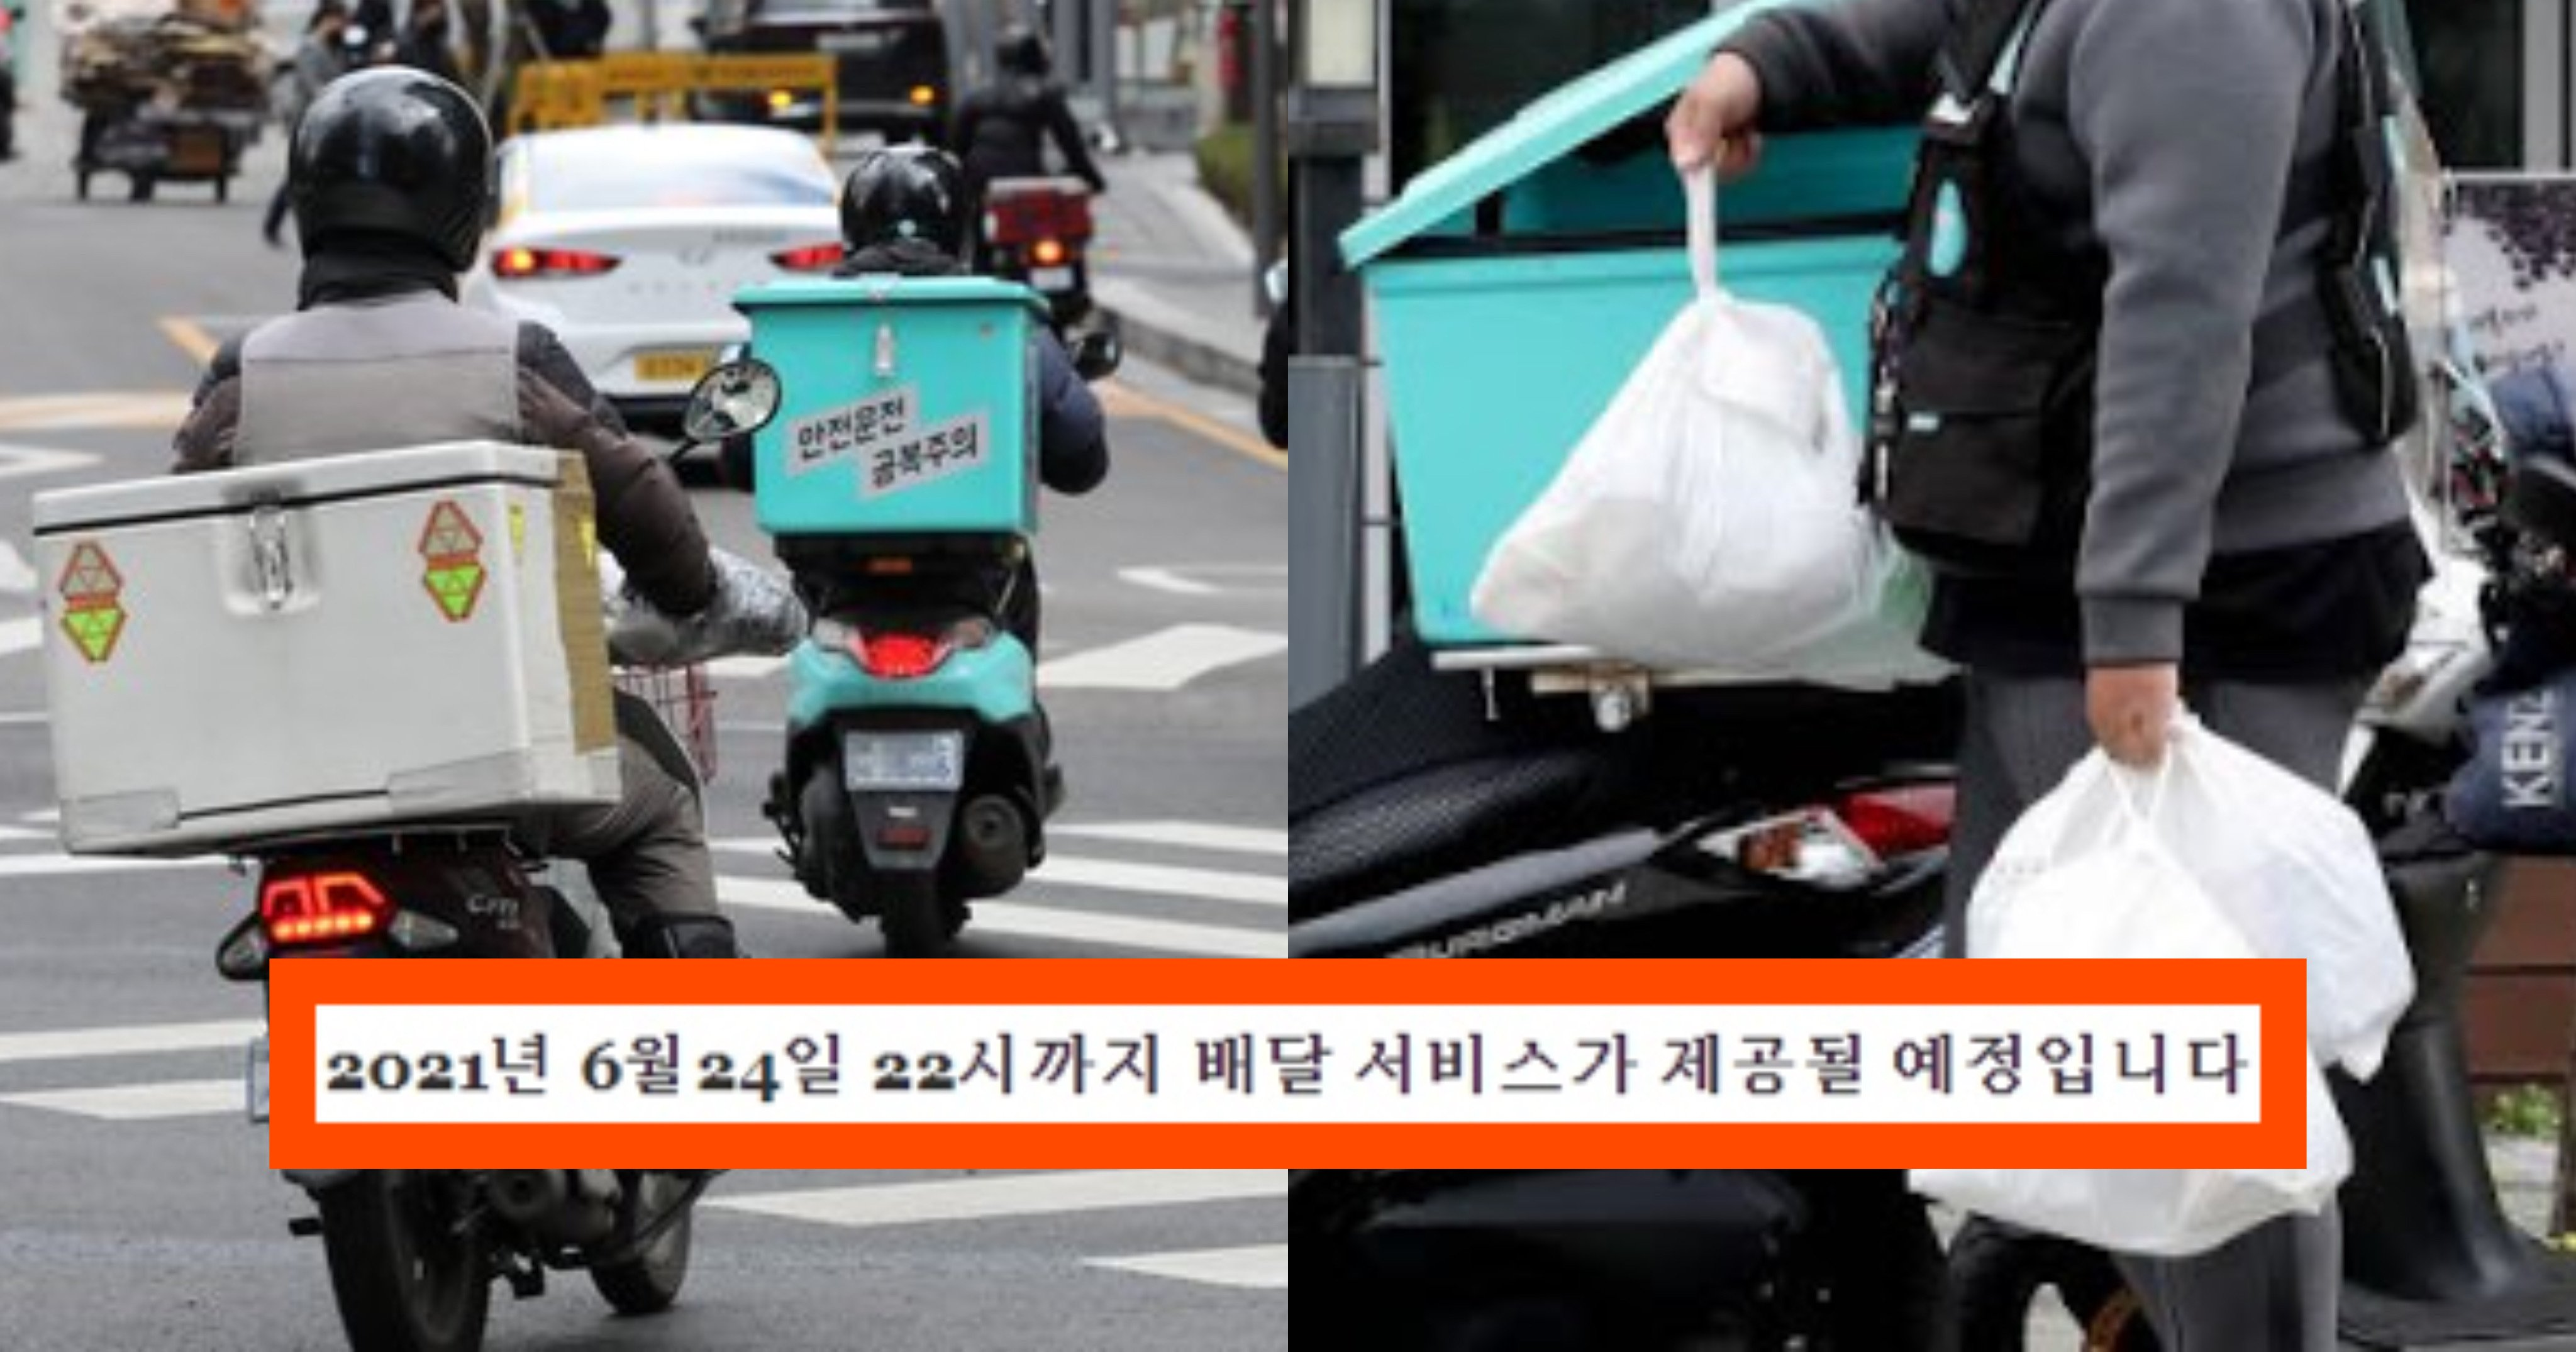 "kakaotalk 20210523 113428481.jpg?resize=1200,630 - ""배달앱 사라진다""...한국에서 최초 배달앱 서비스 종료한다(+공식입장)"